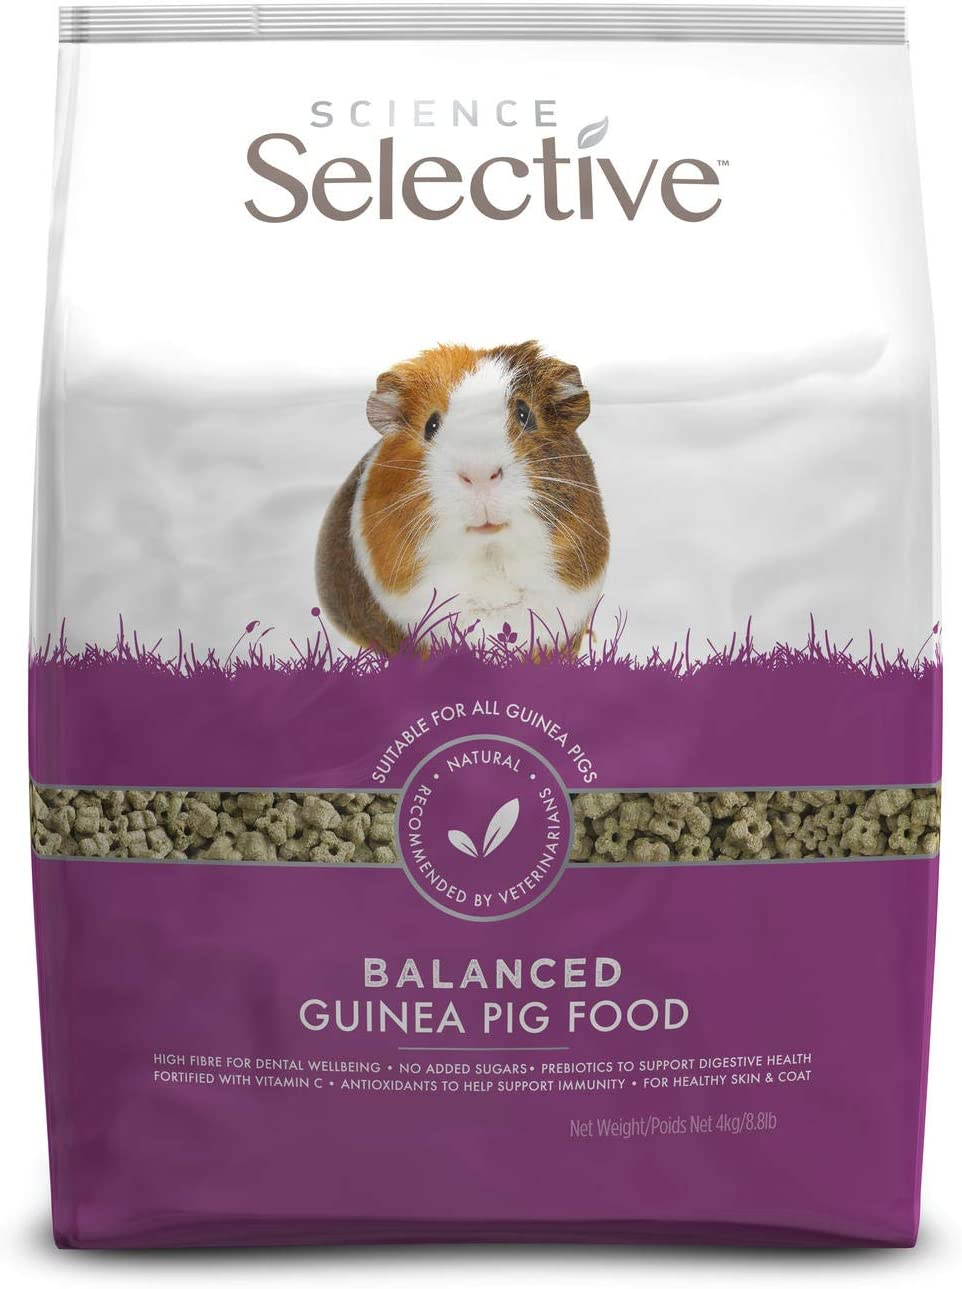 Supreme Science Selective Guinea Pig Food